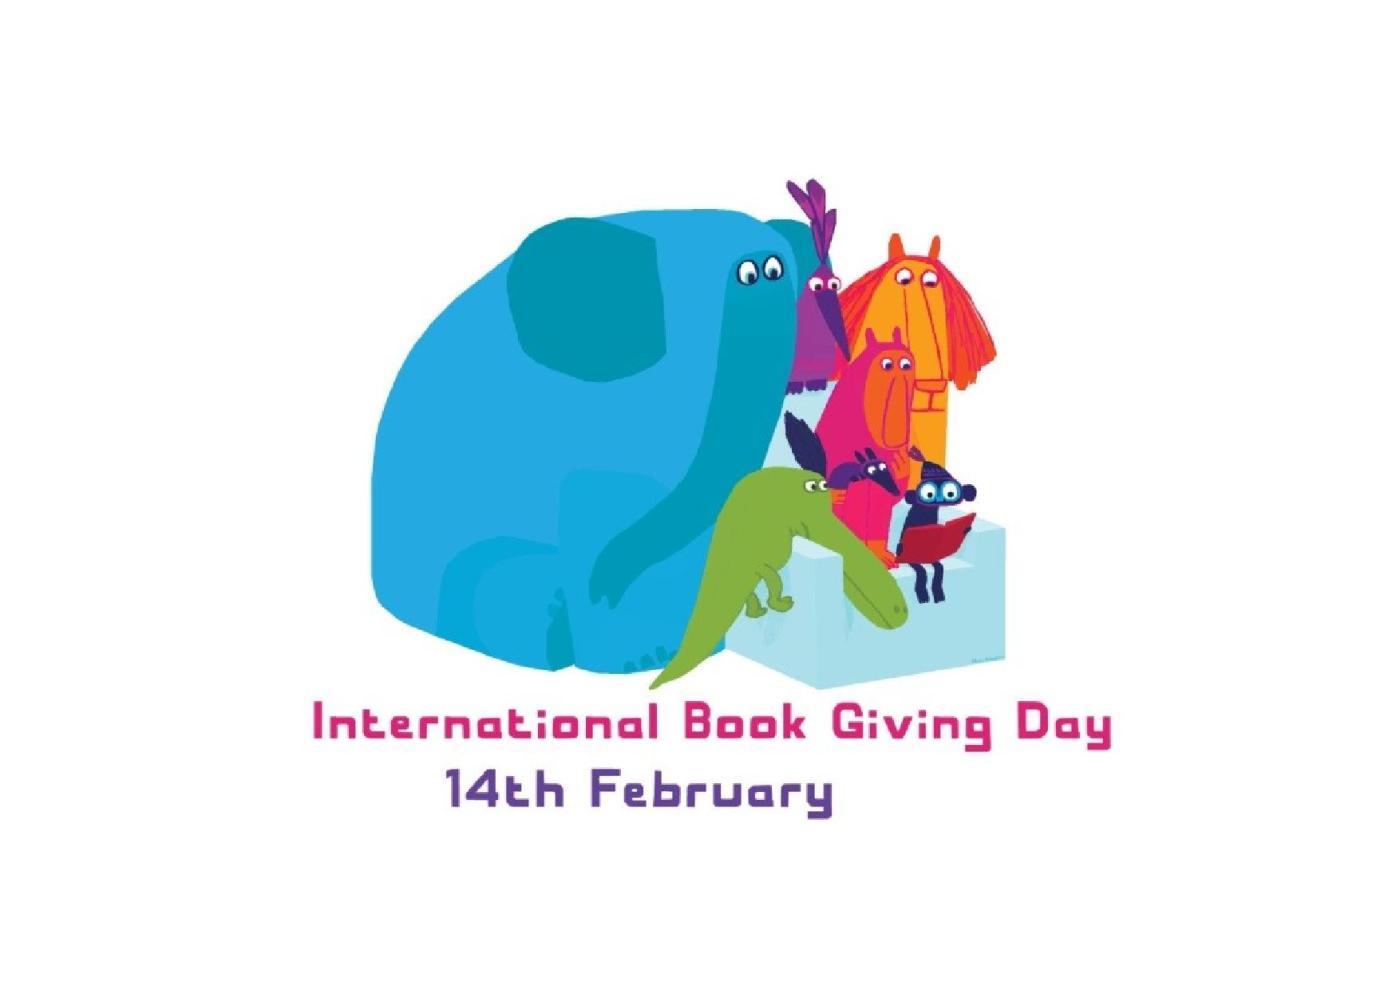 International Book Giving Day - Chris Haughton